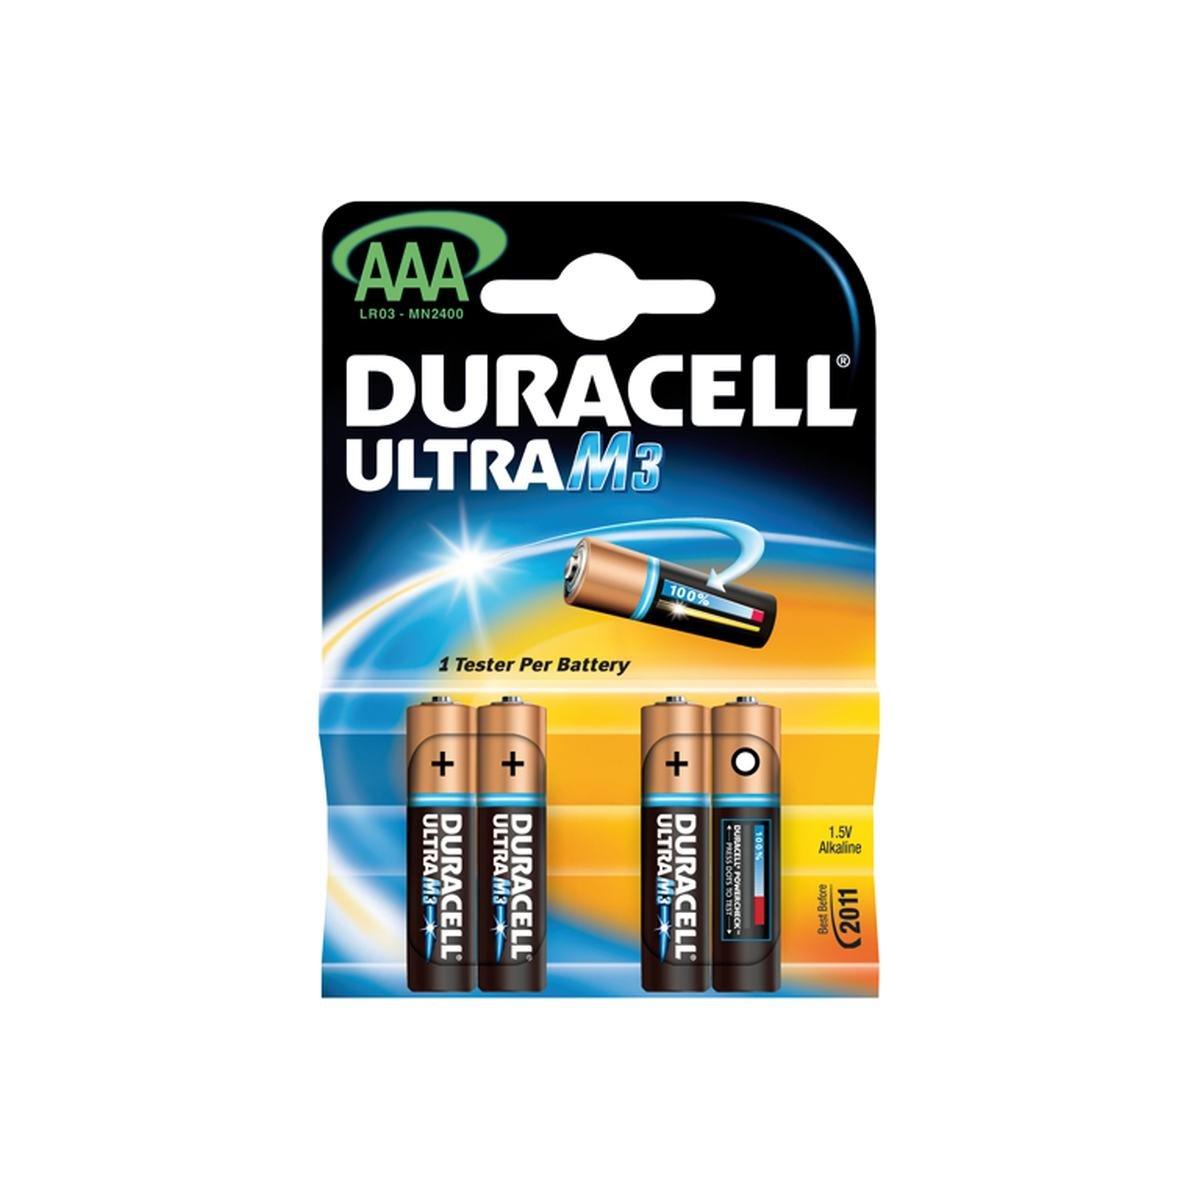 Batteri 1,5V Ultra LR03 / AAA / Micro 4 stk. pakke